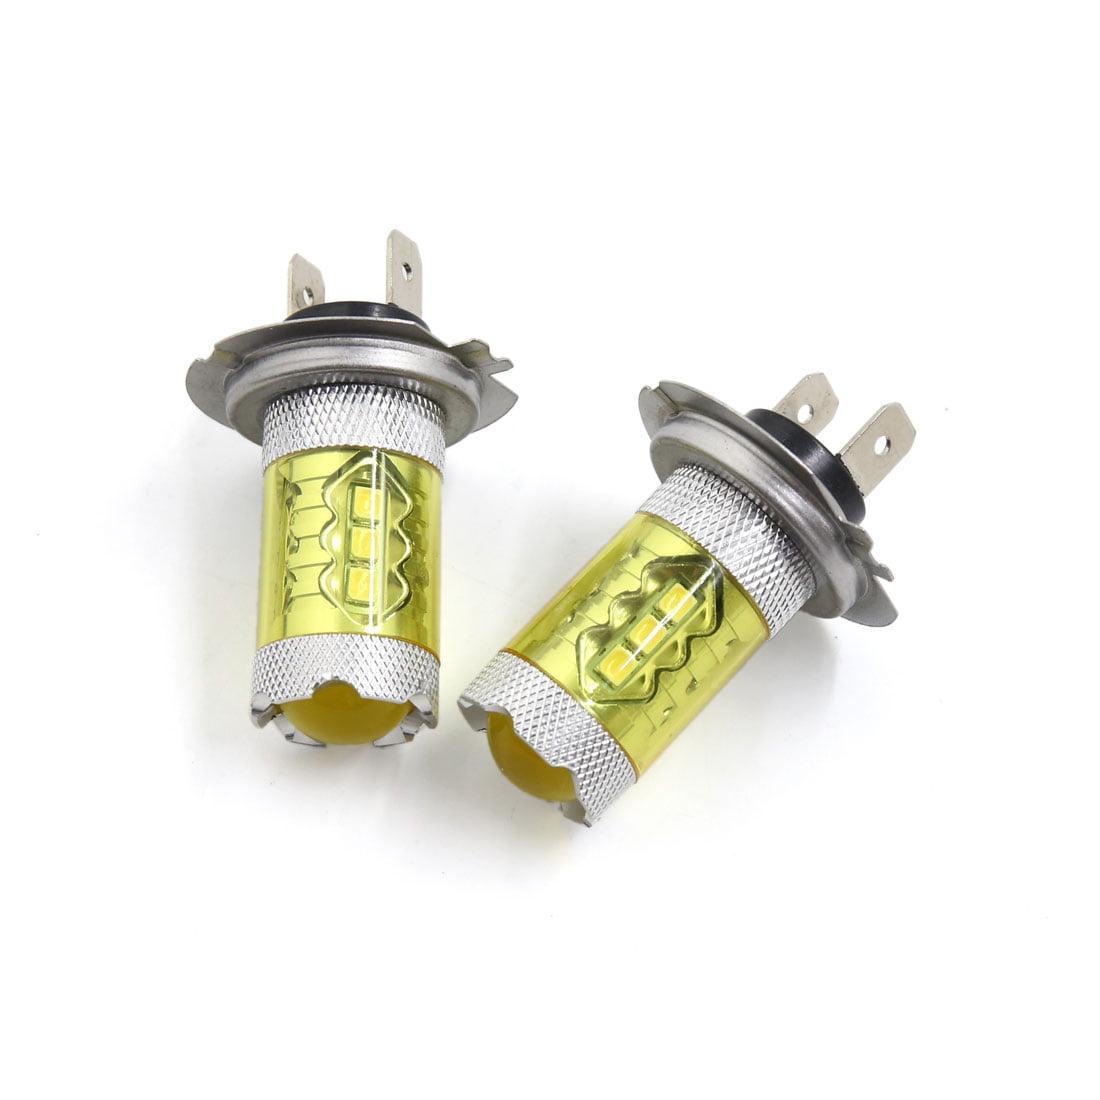 2Pcs 2835 H7  Fog Driving Headlight Yellow Light Lamp Bulbs for Car